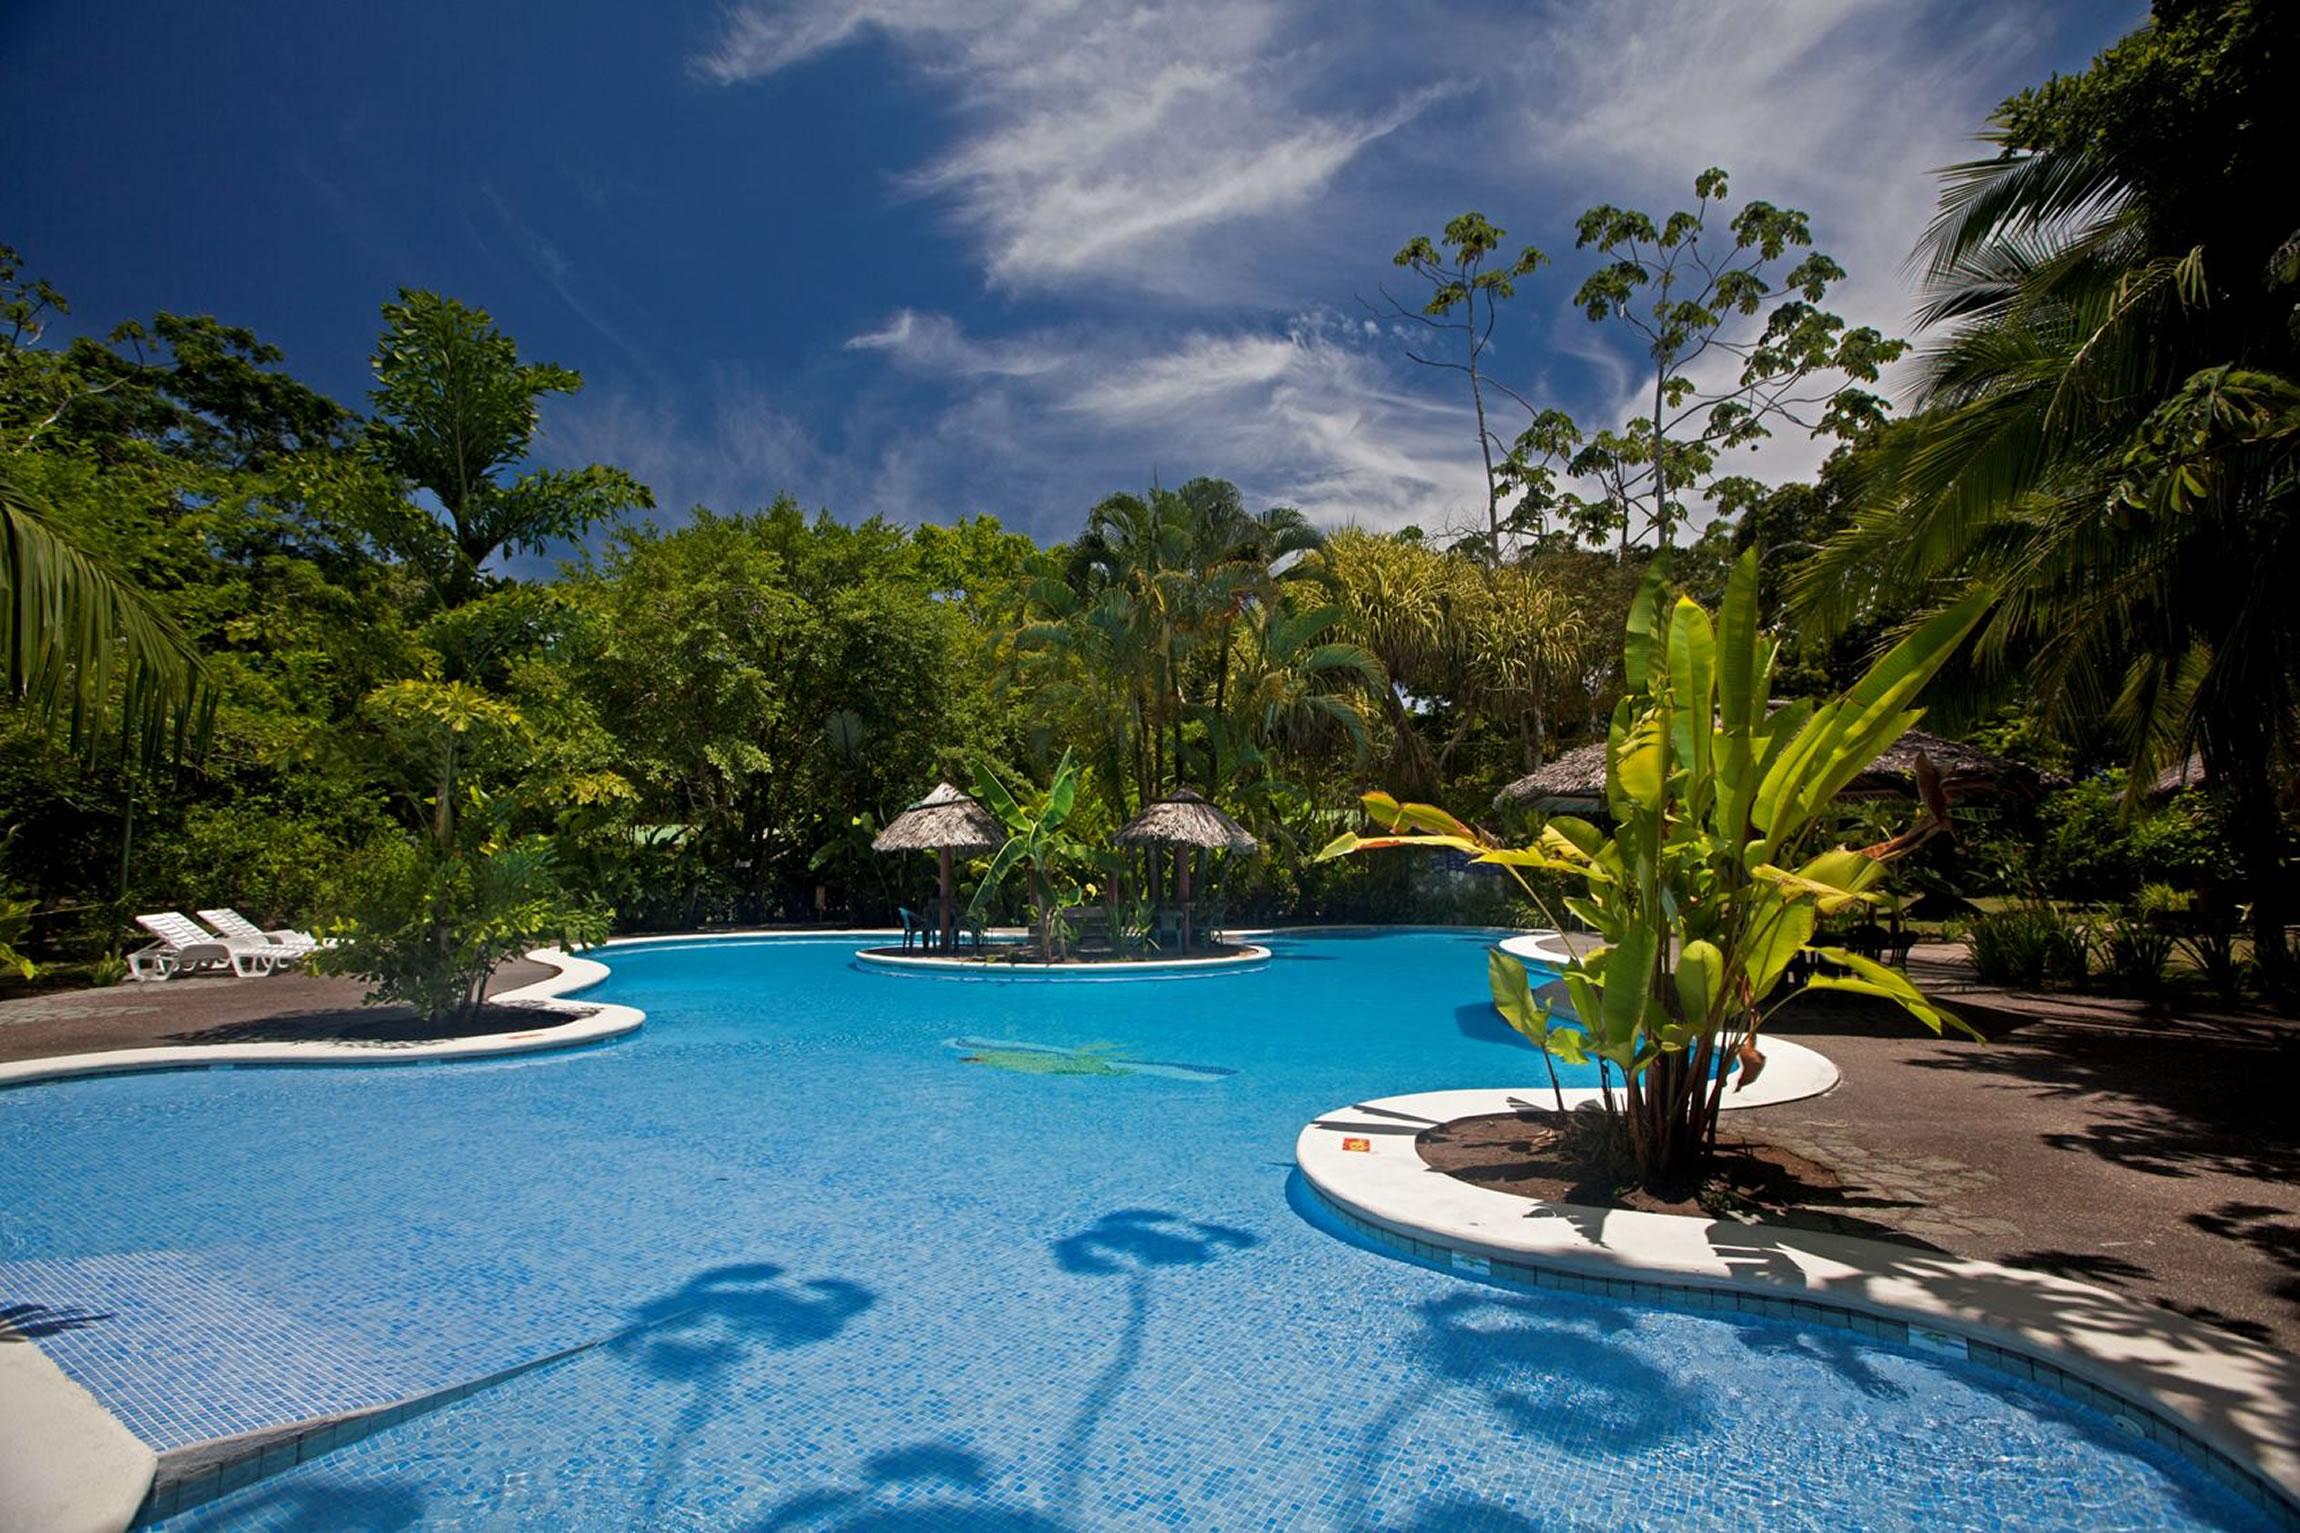 Costa-Rica-Holiday-Tours-Laguna-Lodge-Pool